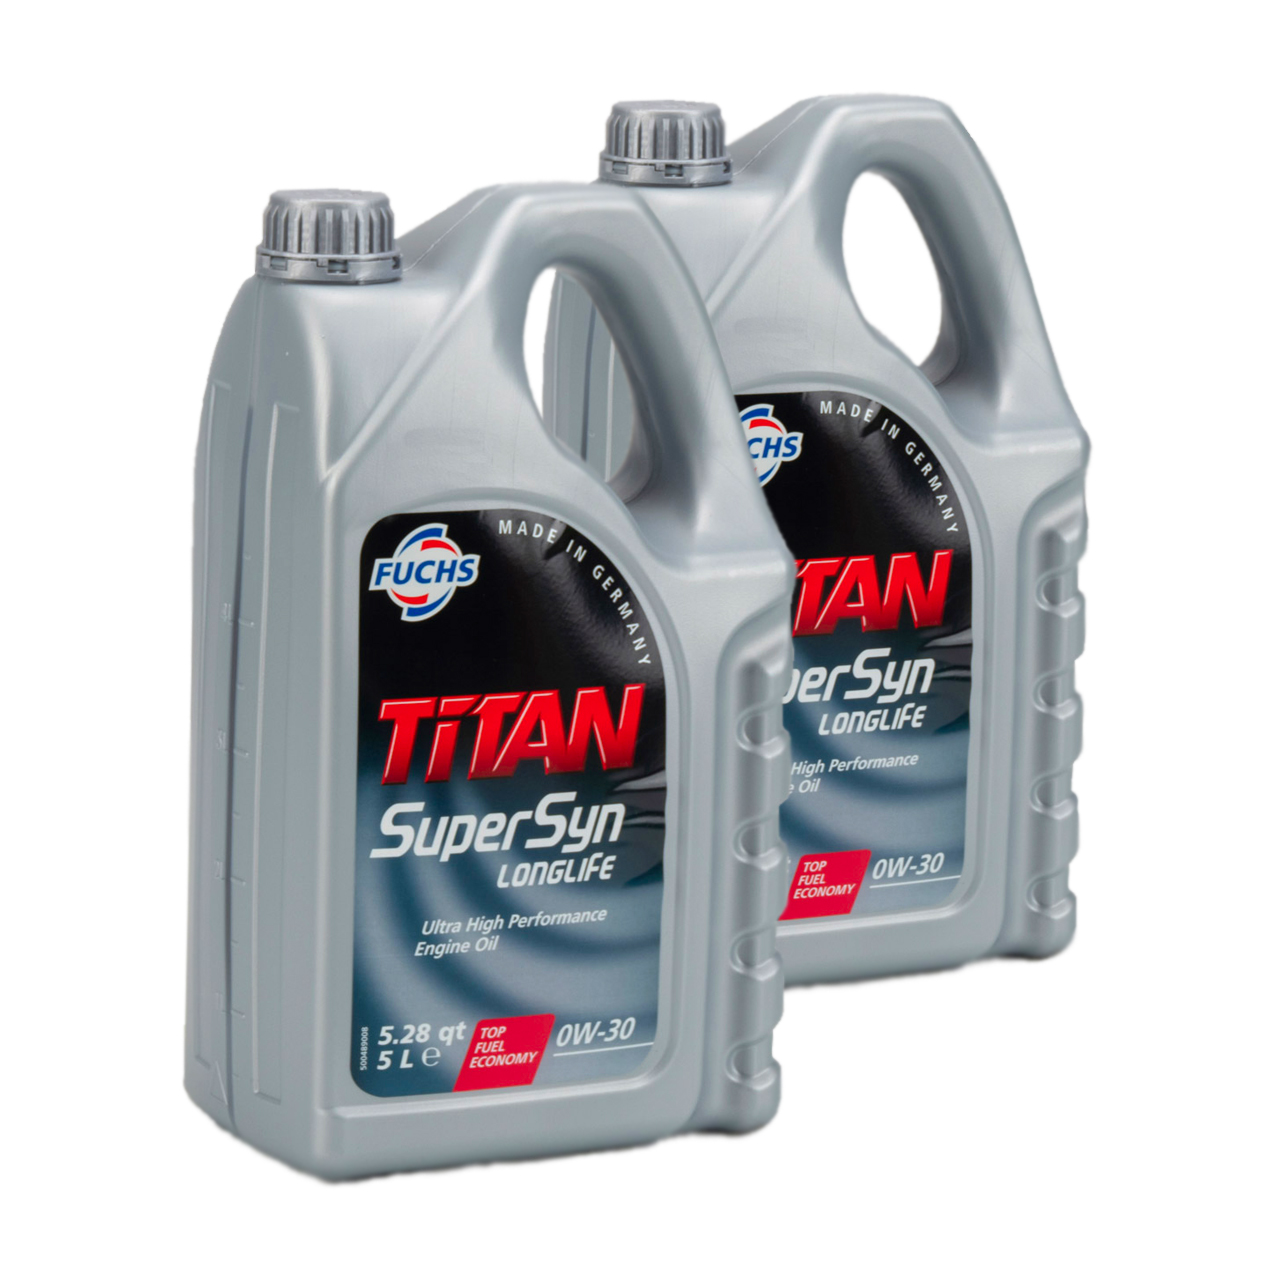 FUCHS Motoröl ÖL TITAN SUPERSYN LONGLIFE 0W30 MB 229.5 VW 502/505.00 - 10 Liter